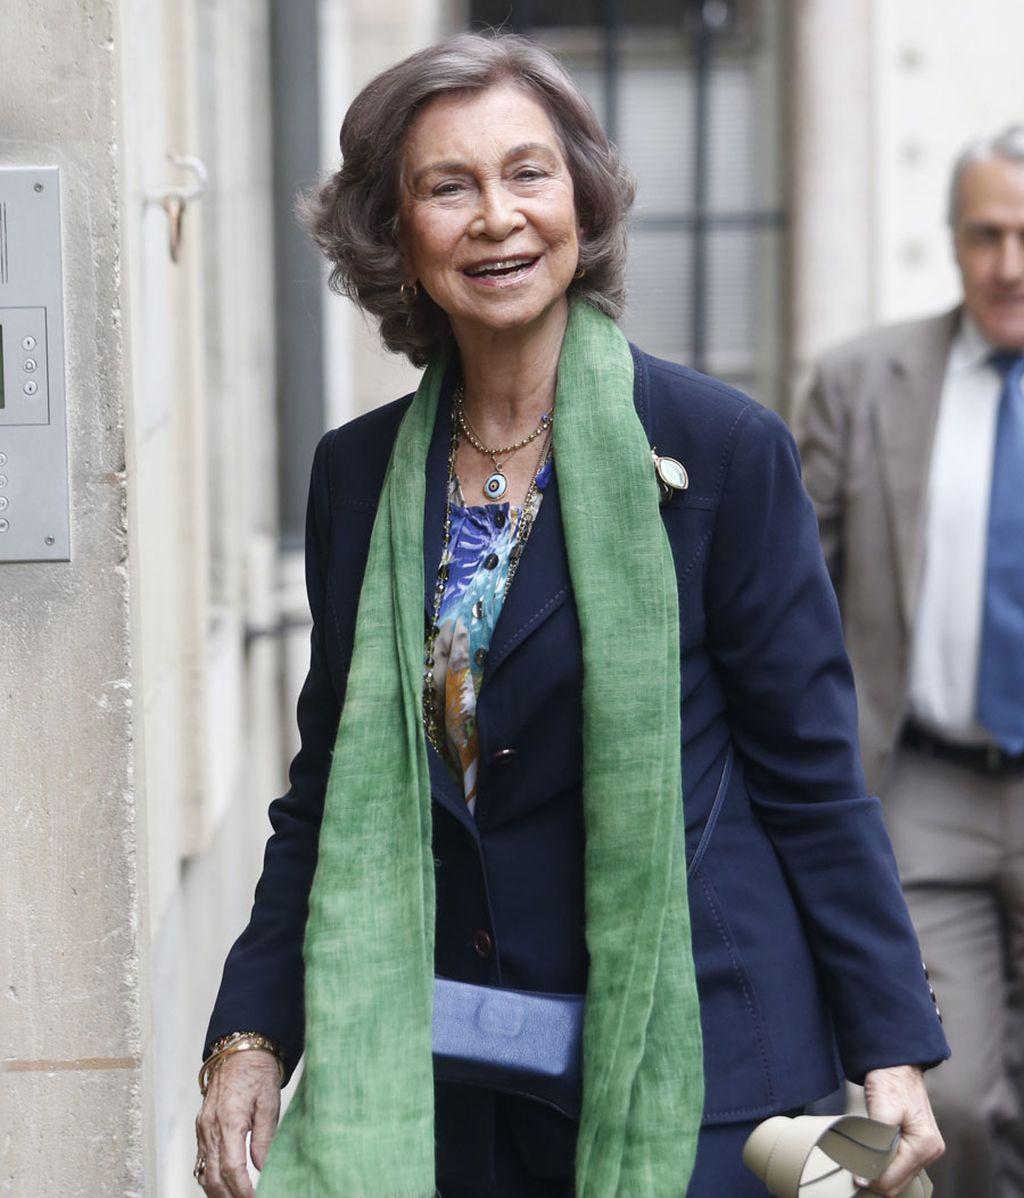 La reina Sofía visita a la infanta Cristina en su casa de Ginebra